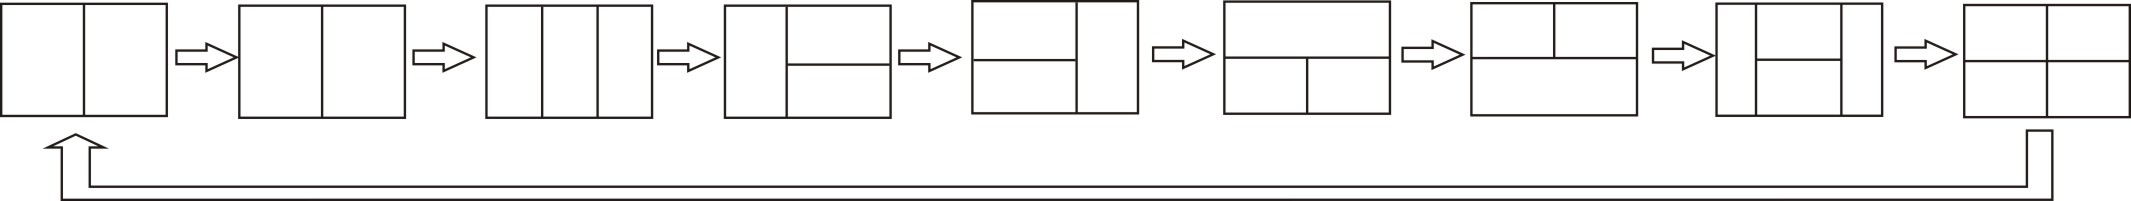 9inch Quad Monitor Four Splits Switch